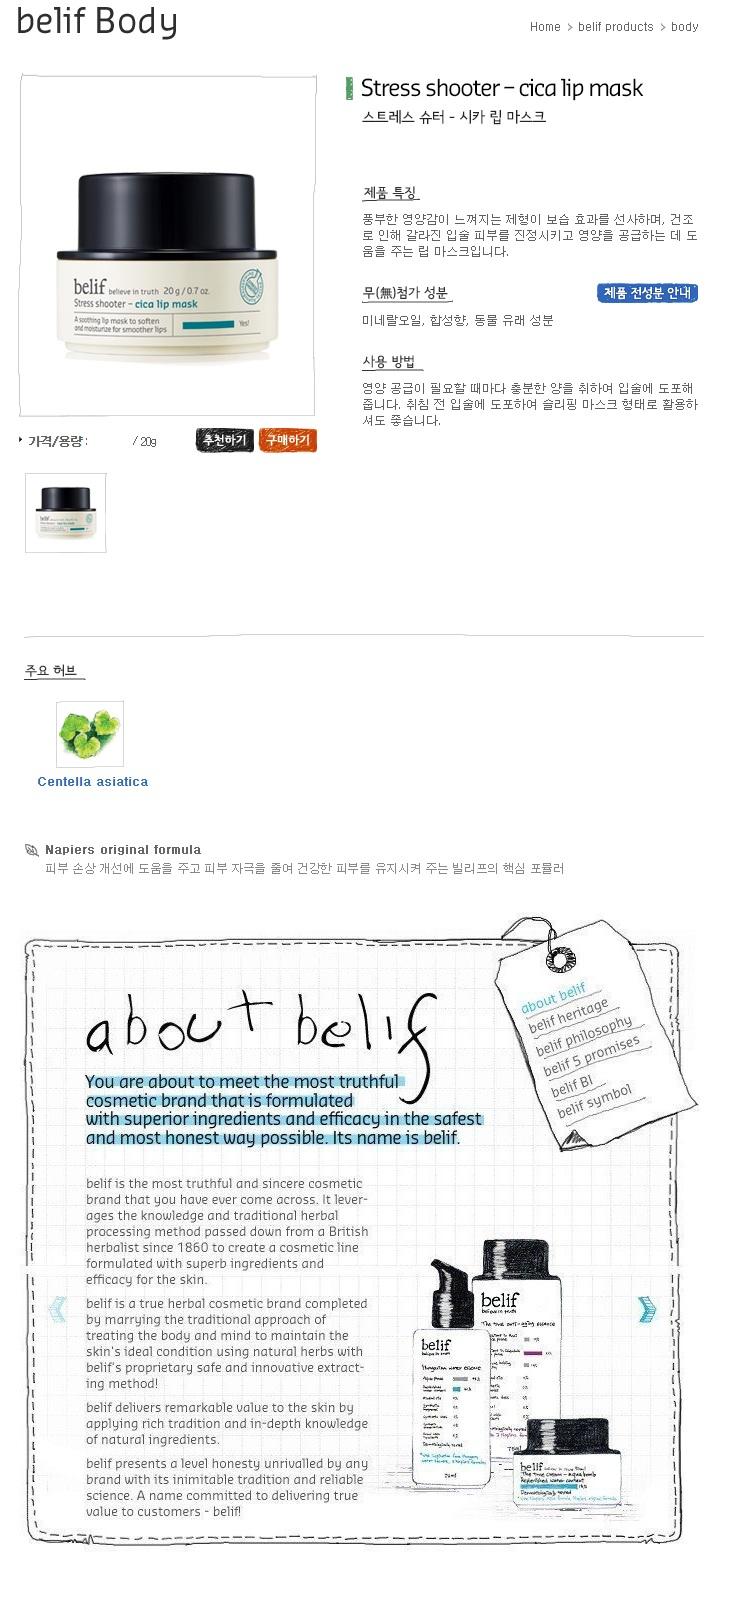 Belif Stress Shooter Cica Lip Mask korean skincare product online shop malaysia China macau